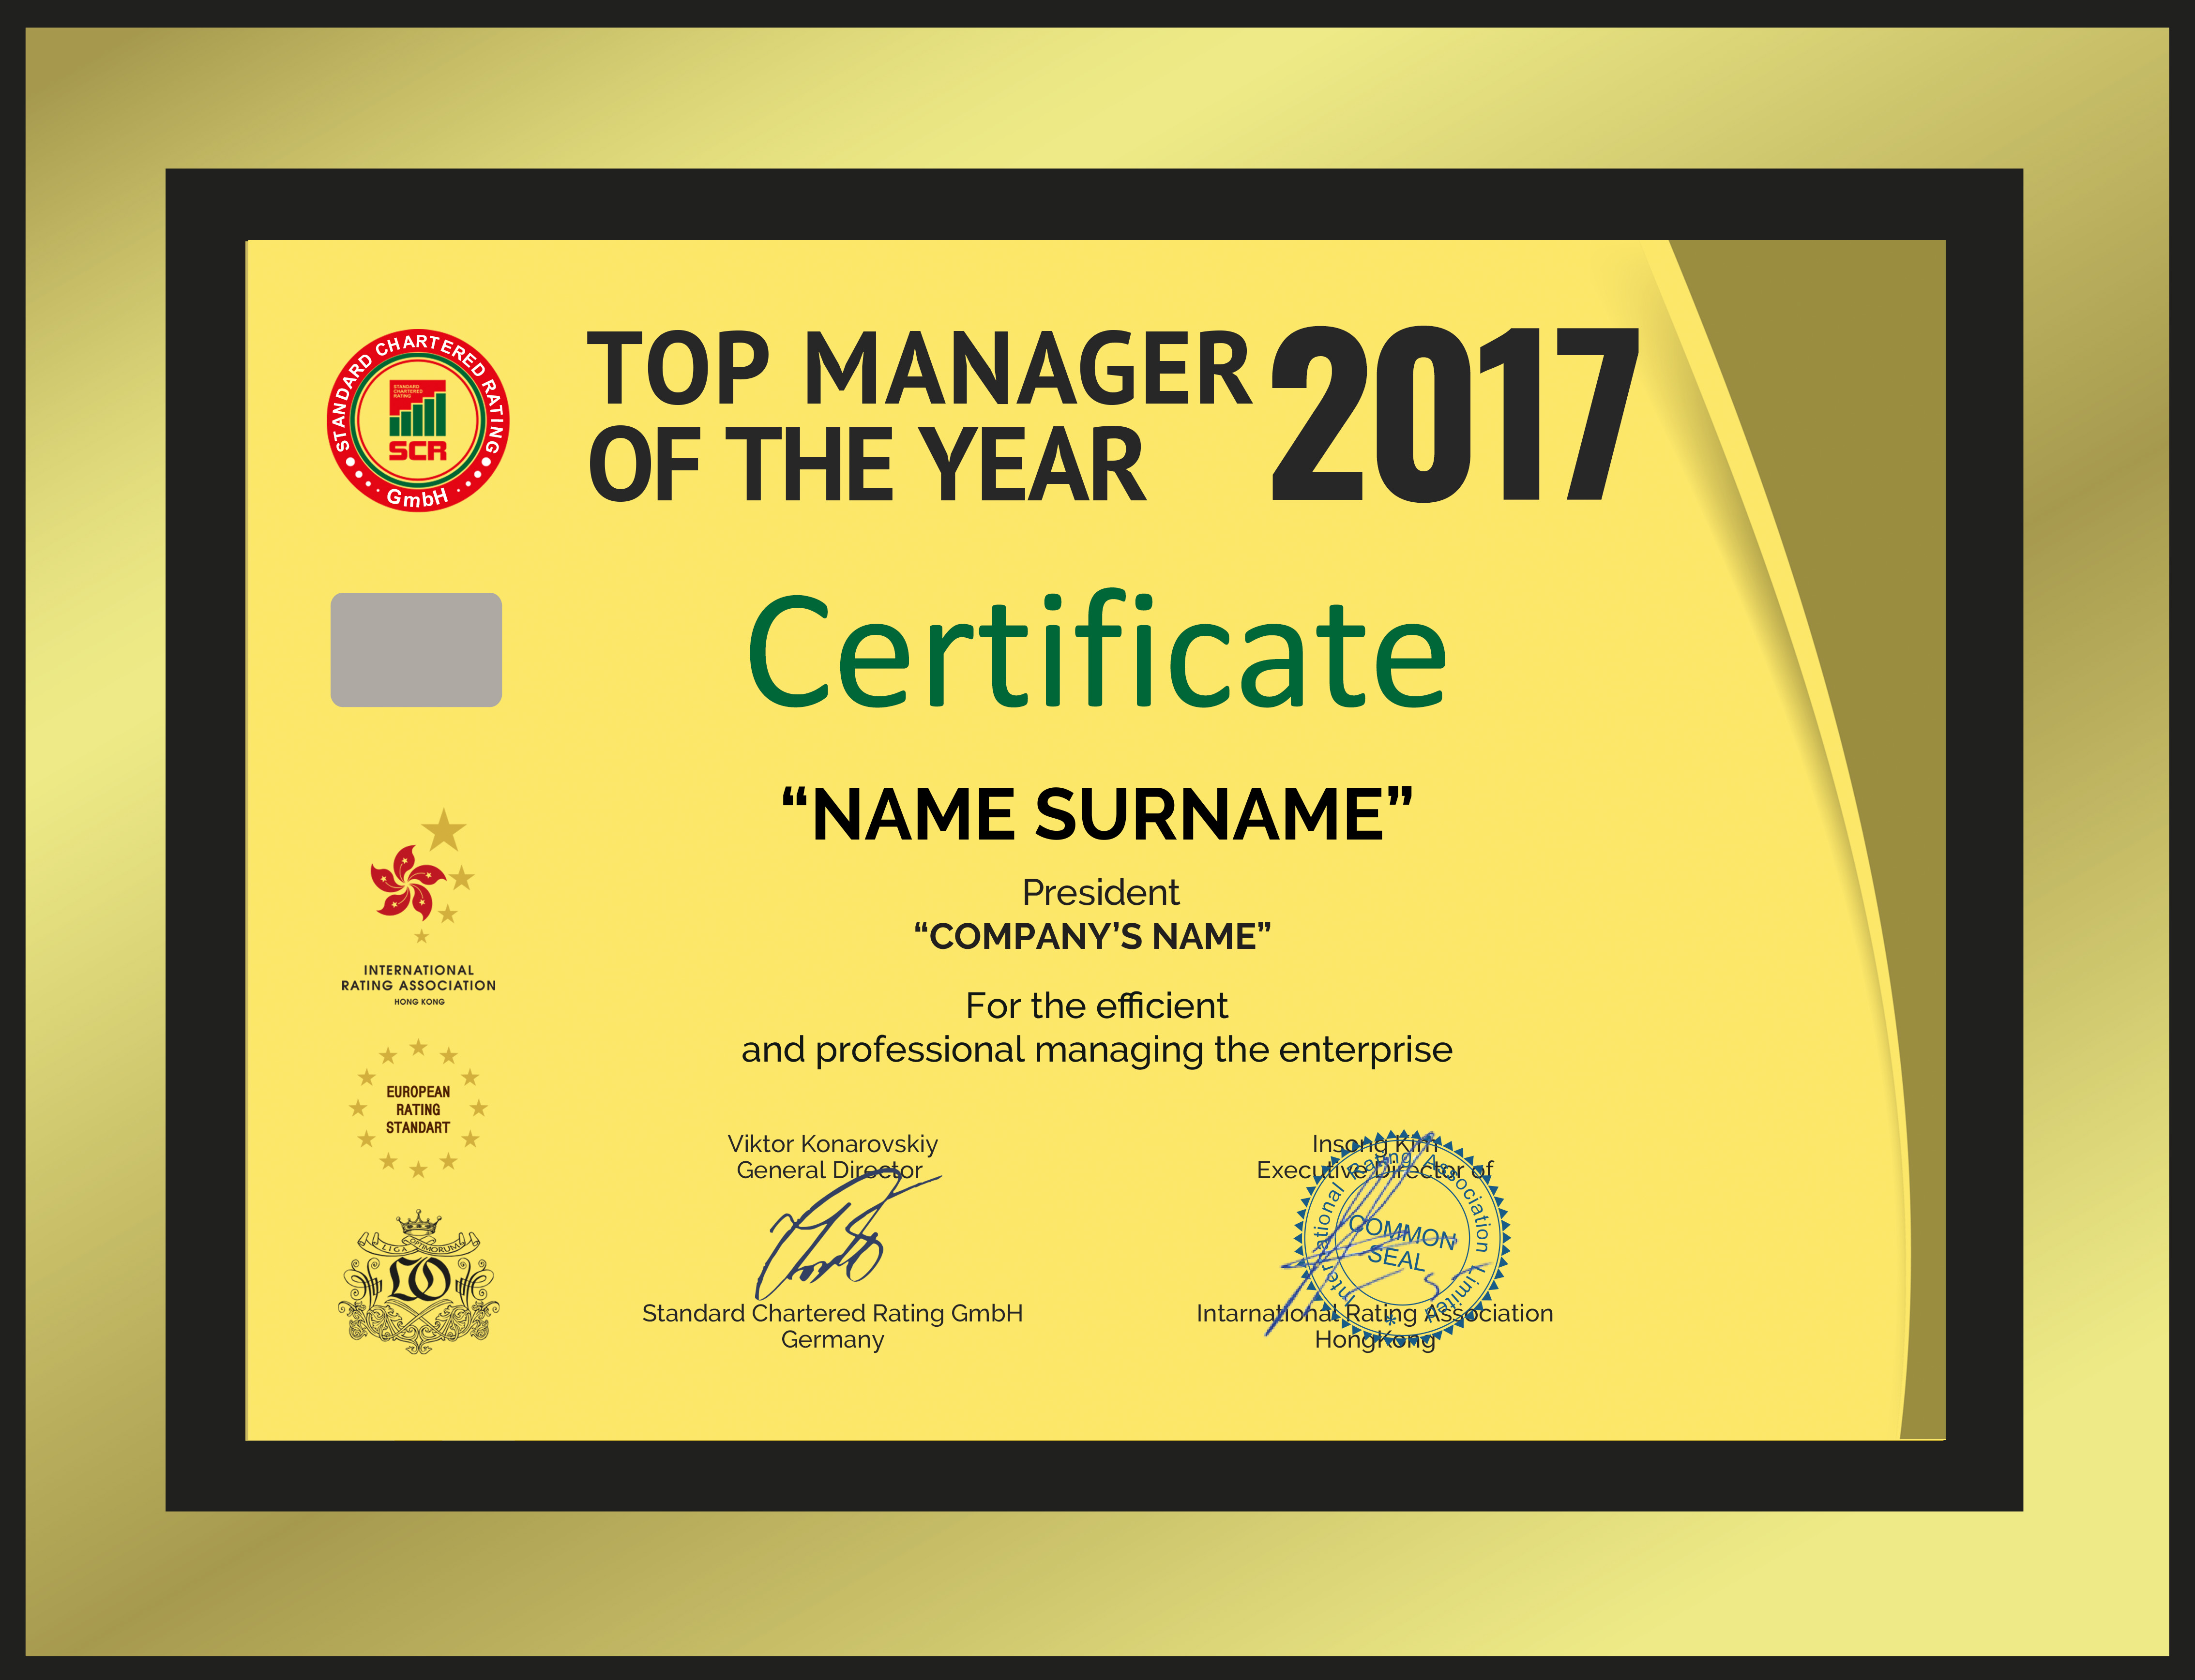 Особиста статус-нагорода «Керівник року — 2017»